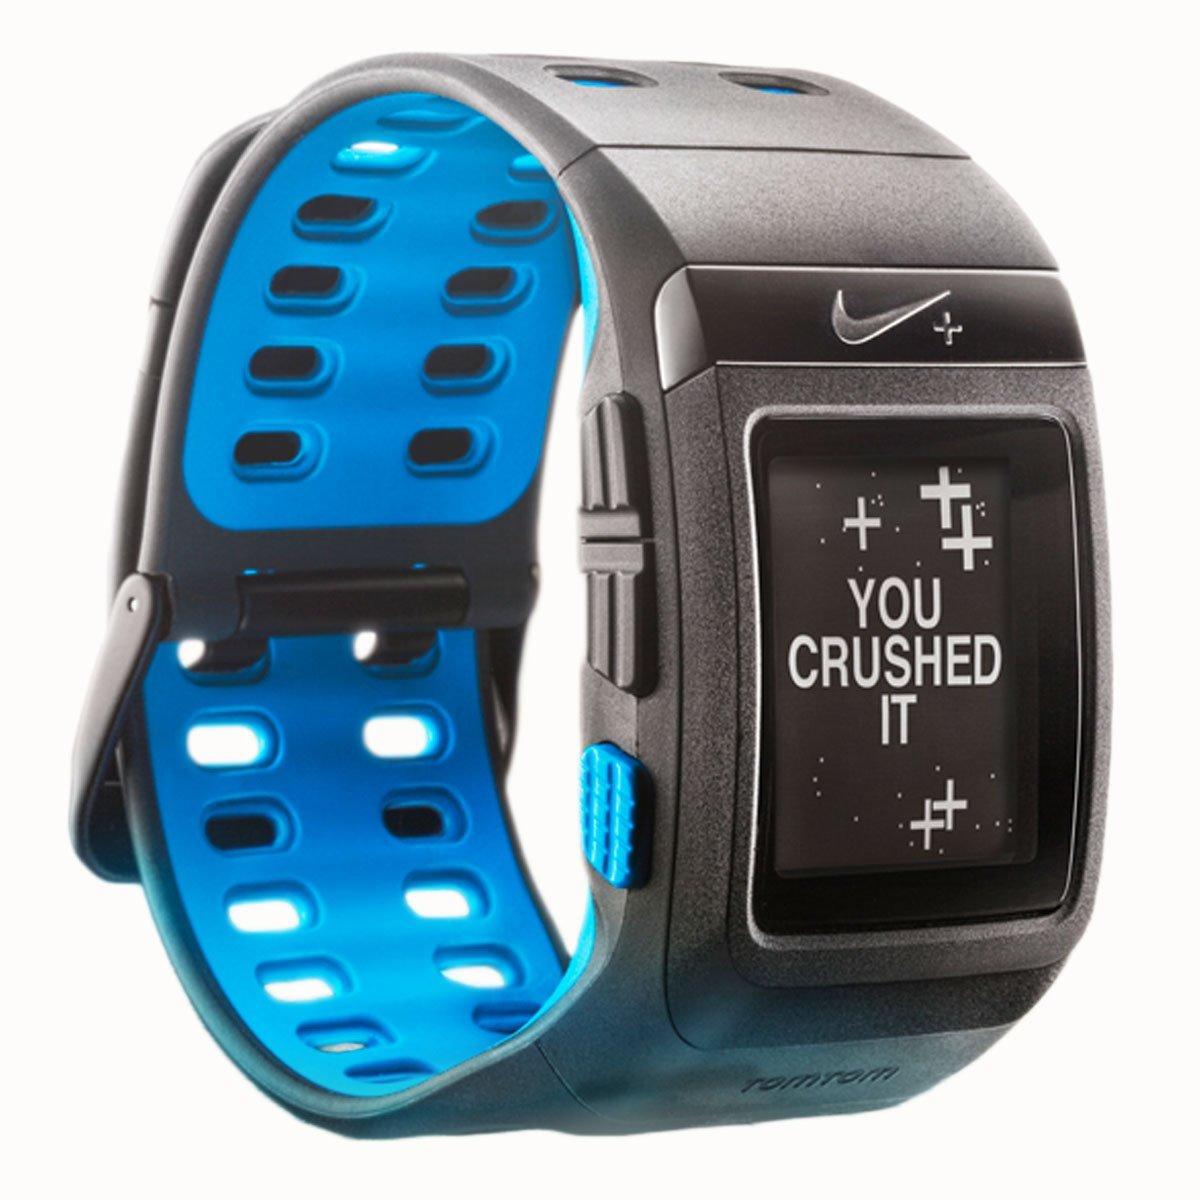 Nike Ipod Nano | Nike Basketball Sensor | Nike Sensor